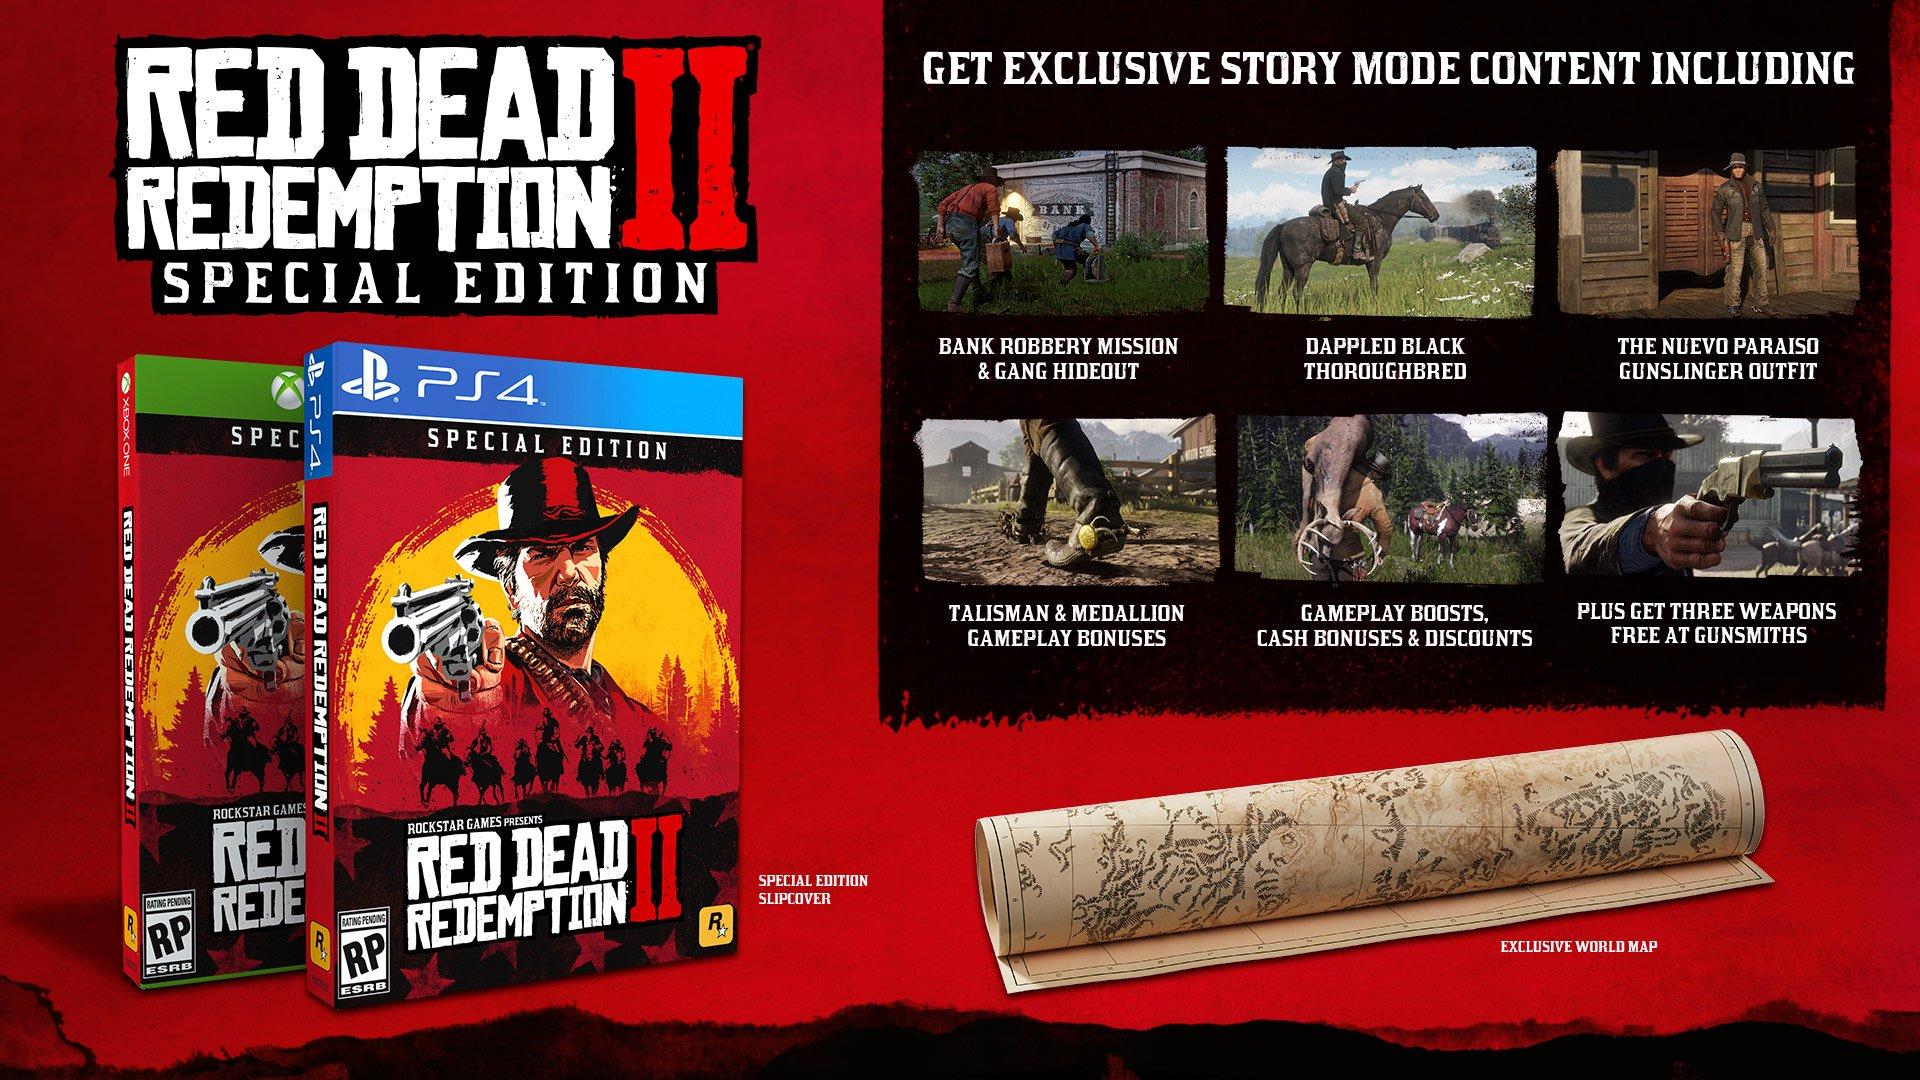 Vytuň si herní doupě #13 - Red Dead Redemption 2 Red Dead Redemption specialni edice 1